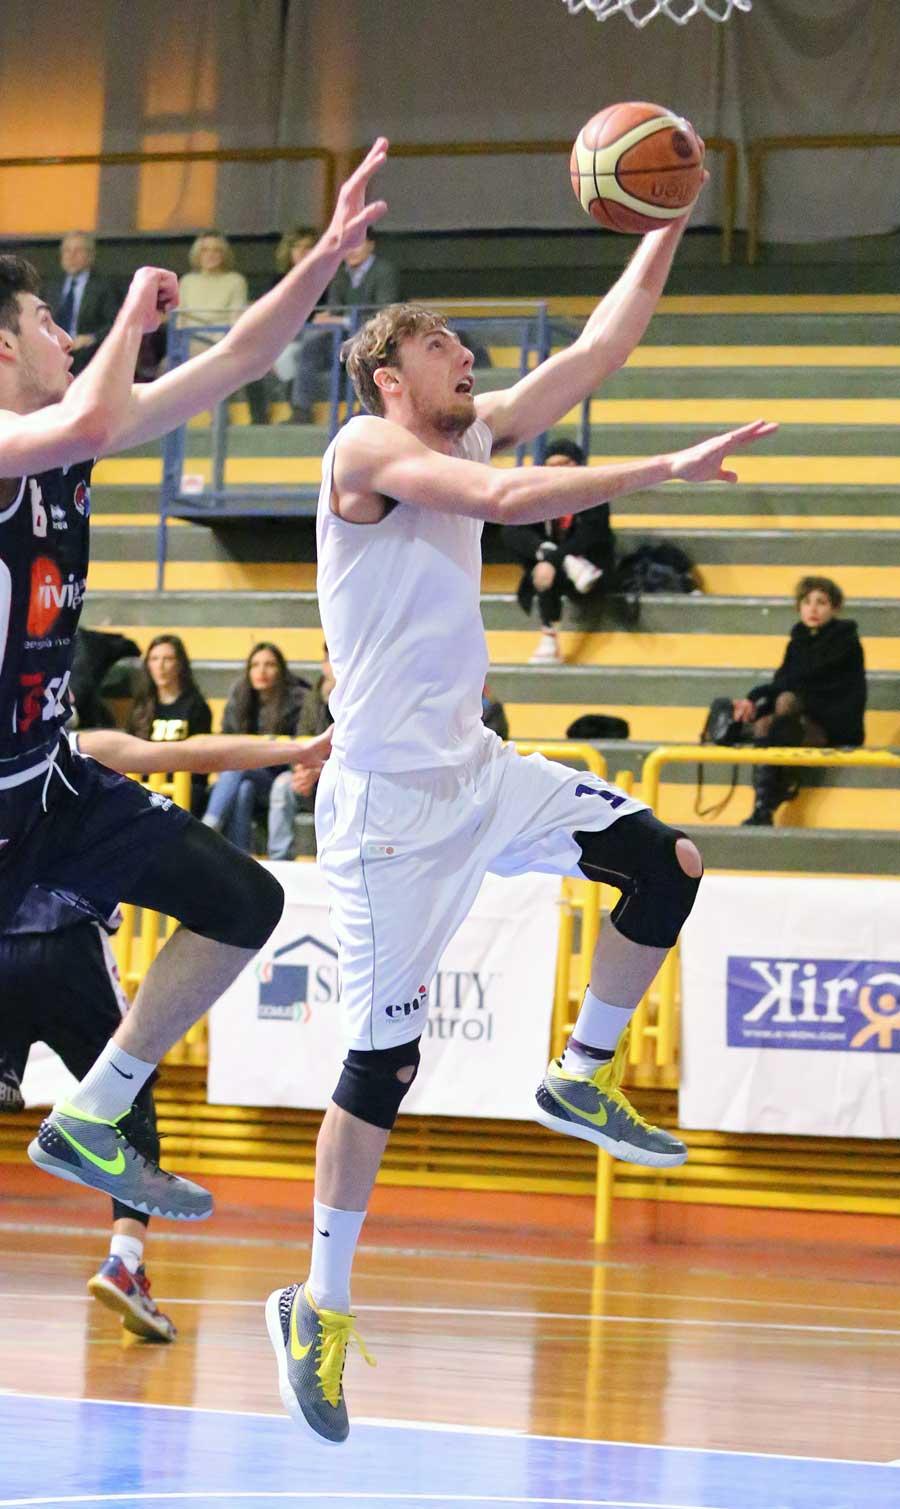 09_bianchi_basket_fiorentina_altosebino2016